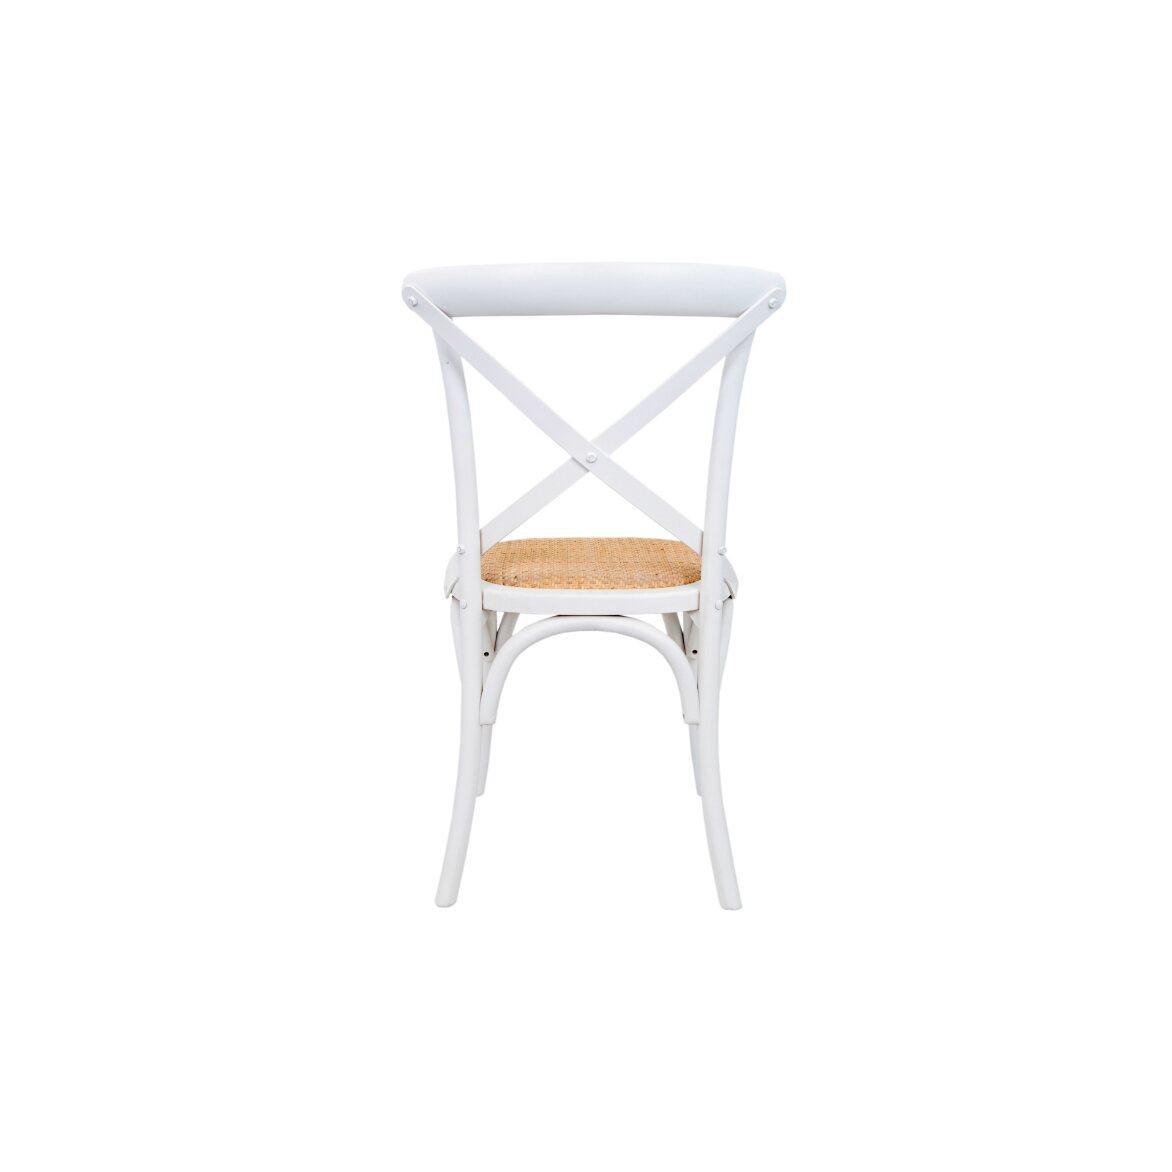 Стул Cross back white 3 | Обеденные стулья Kingsby